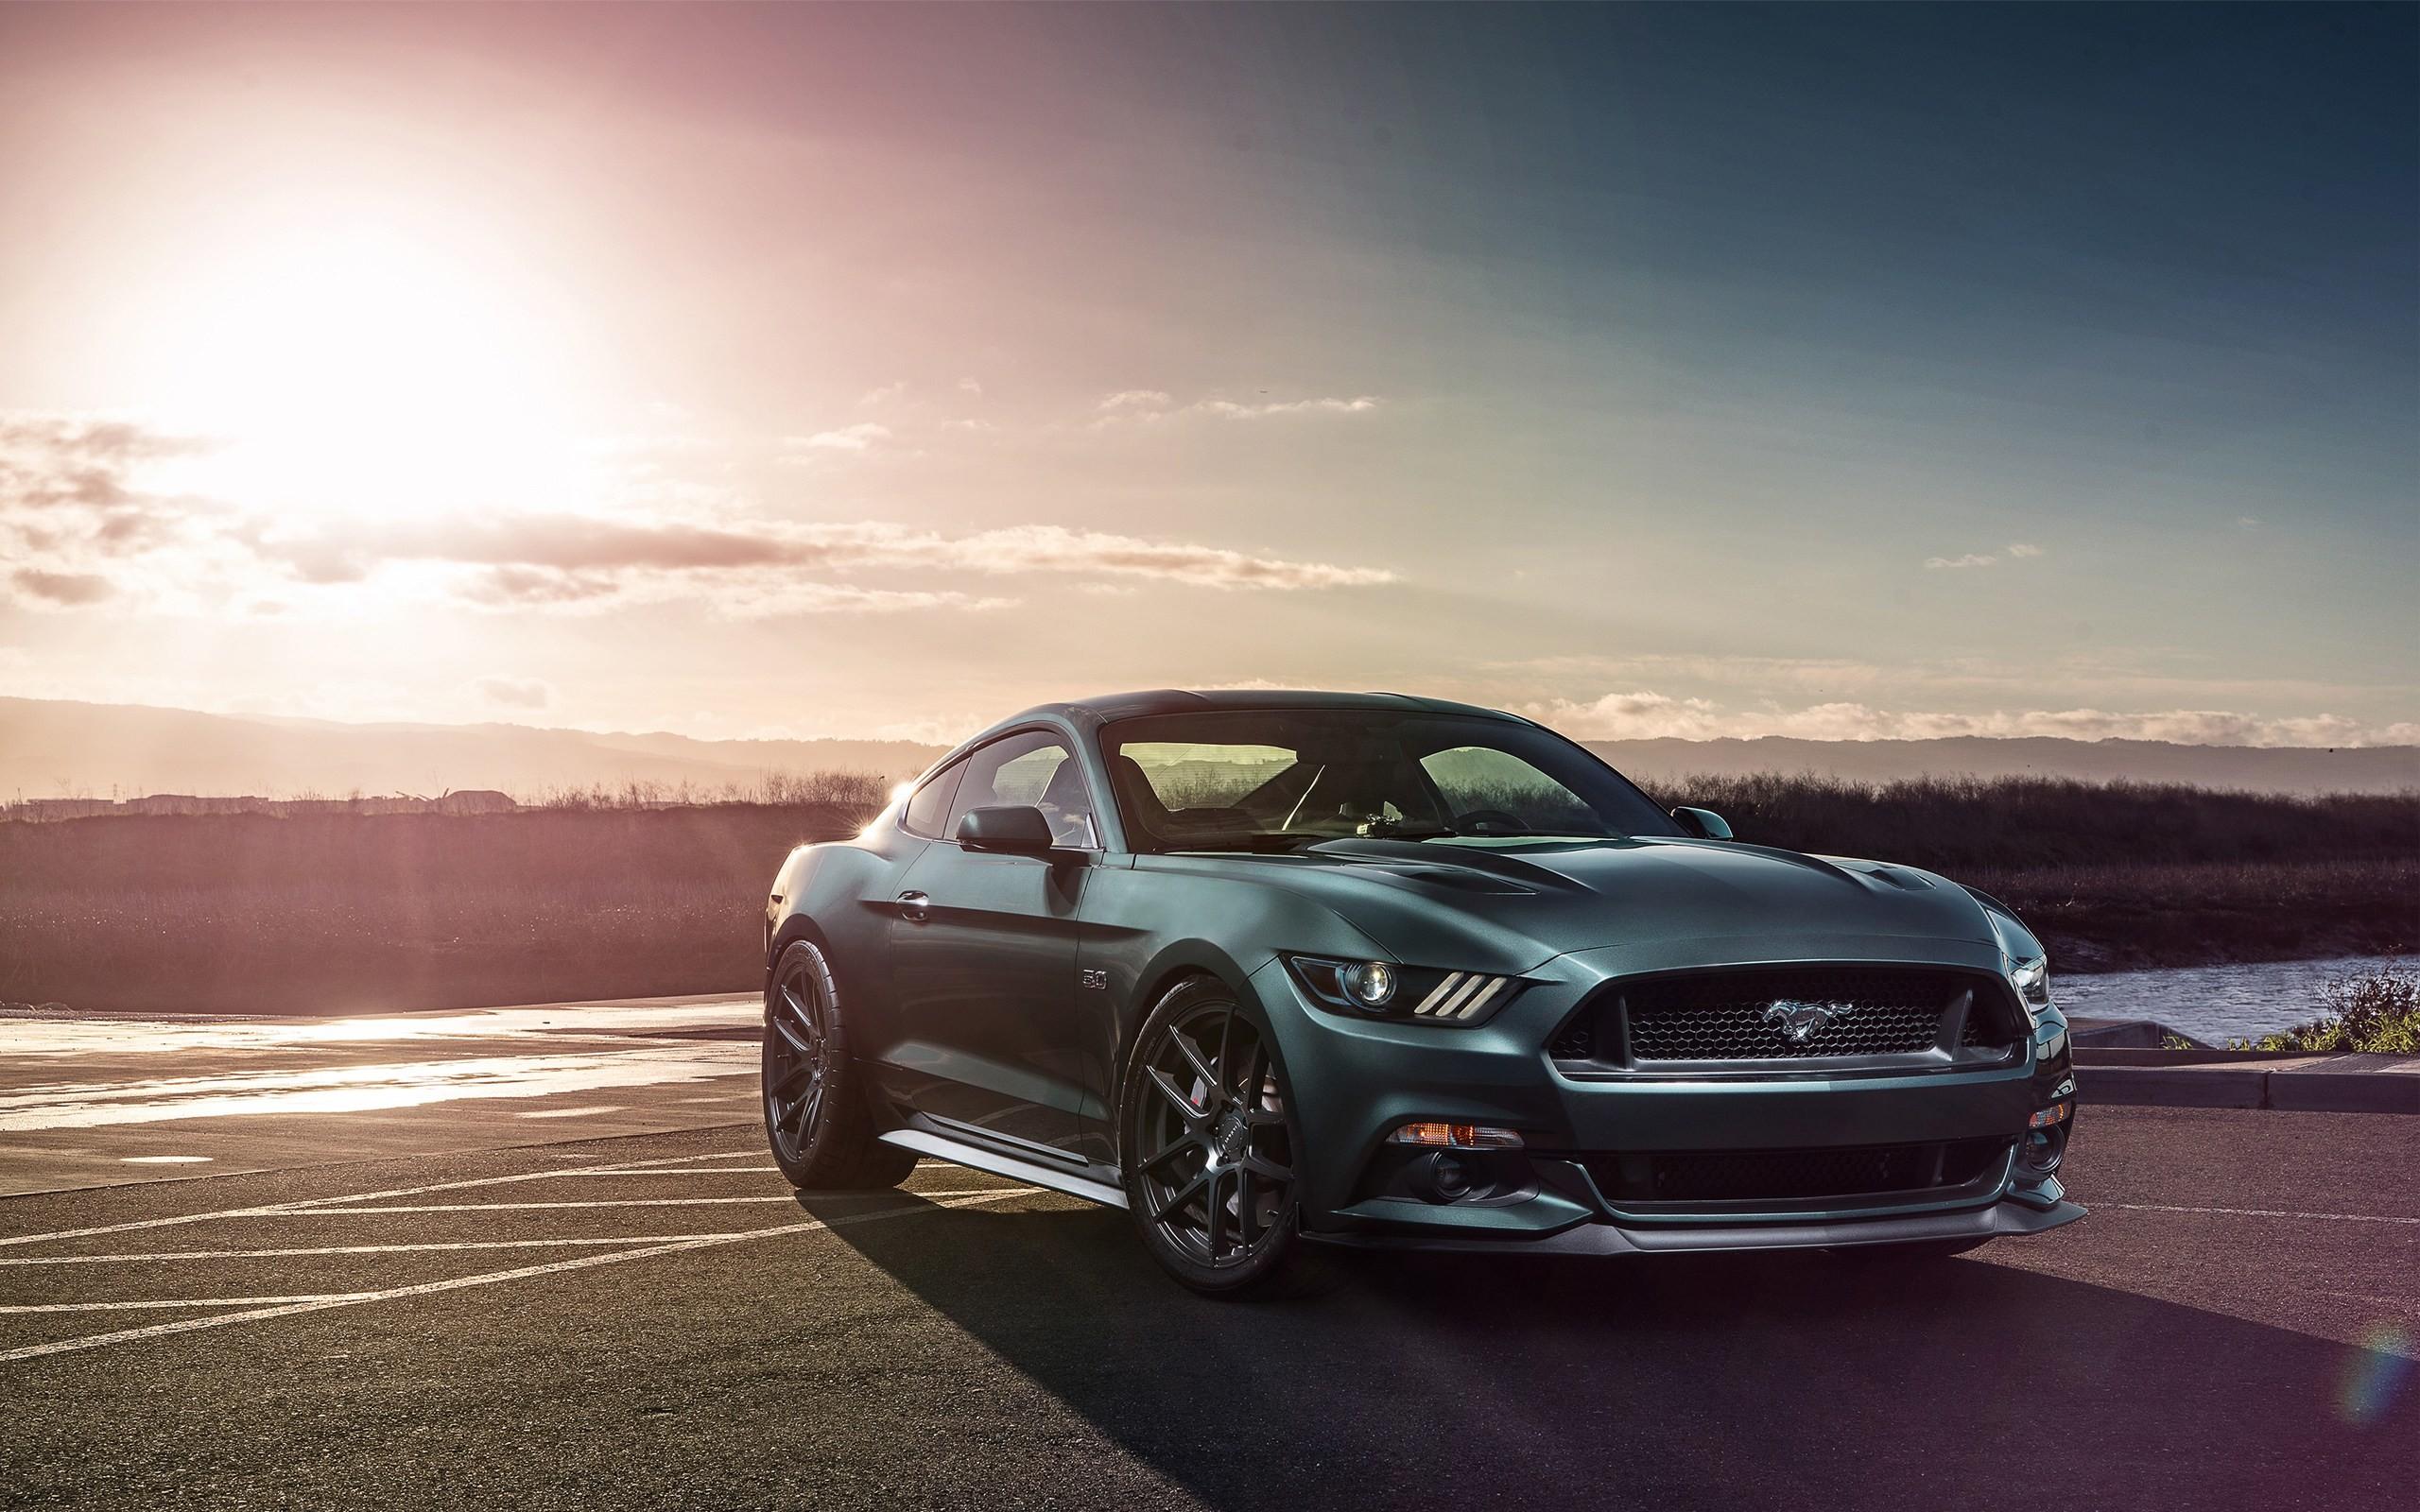 2018 Mustang Wallpaper >> 2018 Mustang Gt Wallpaper